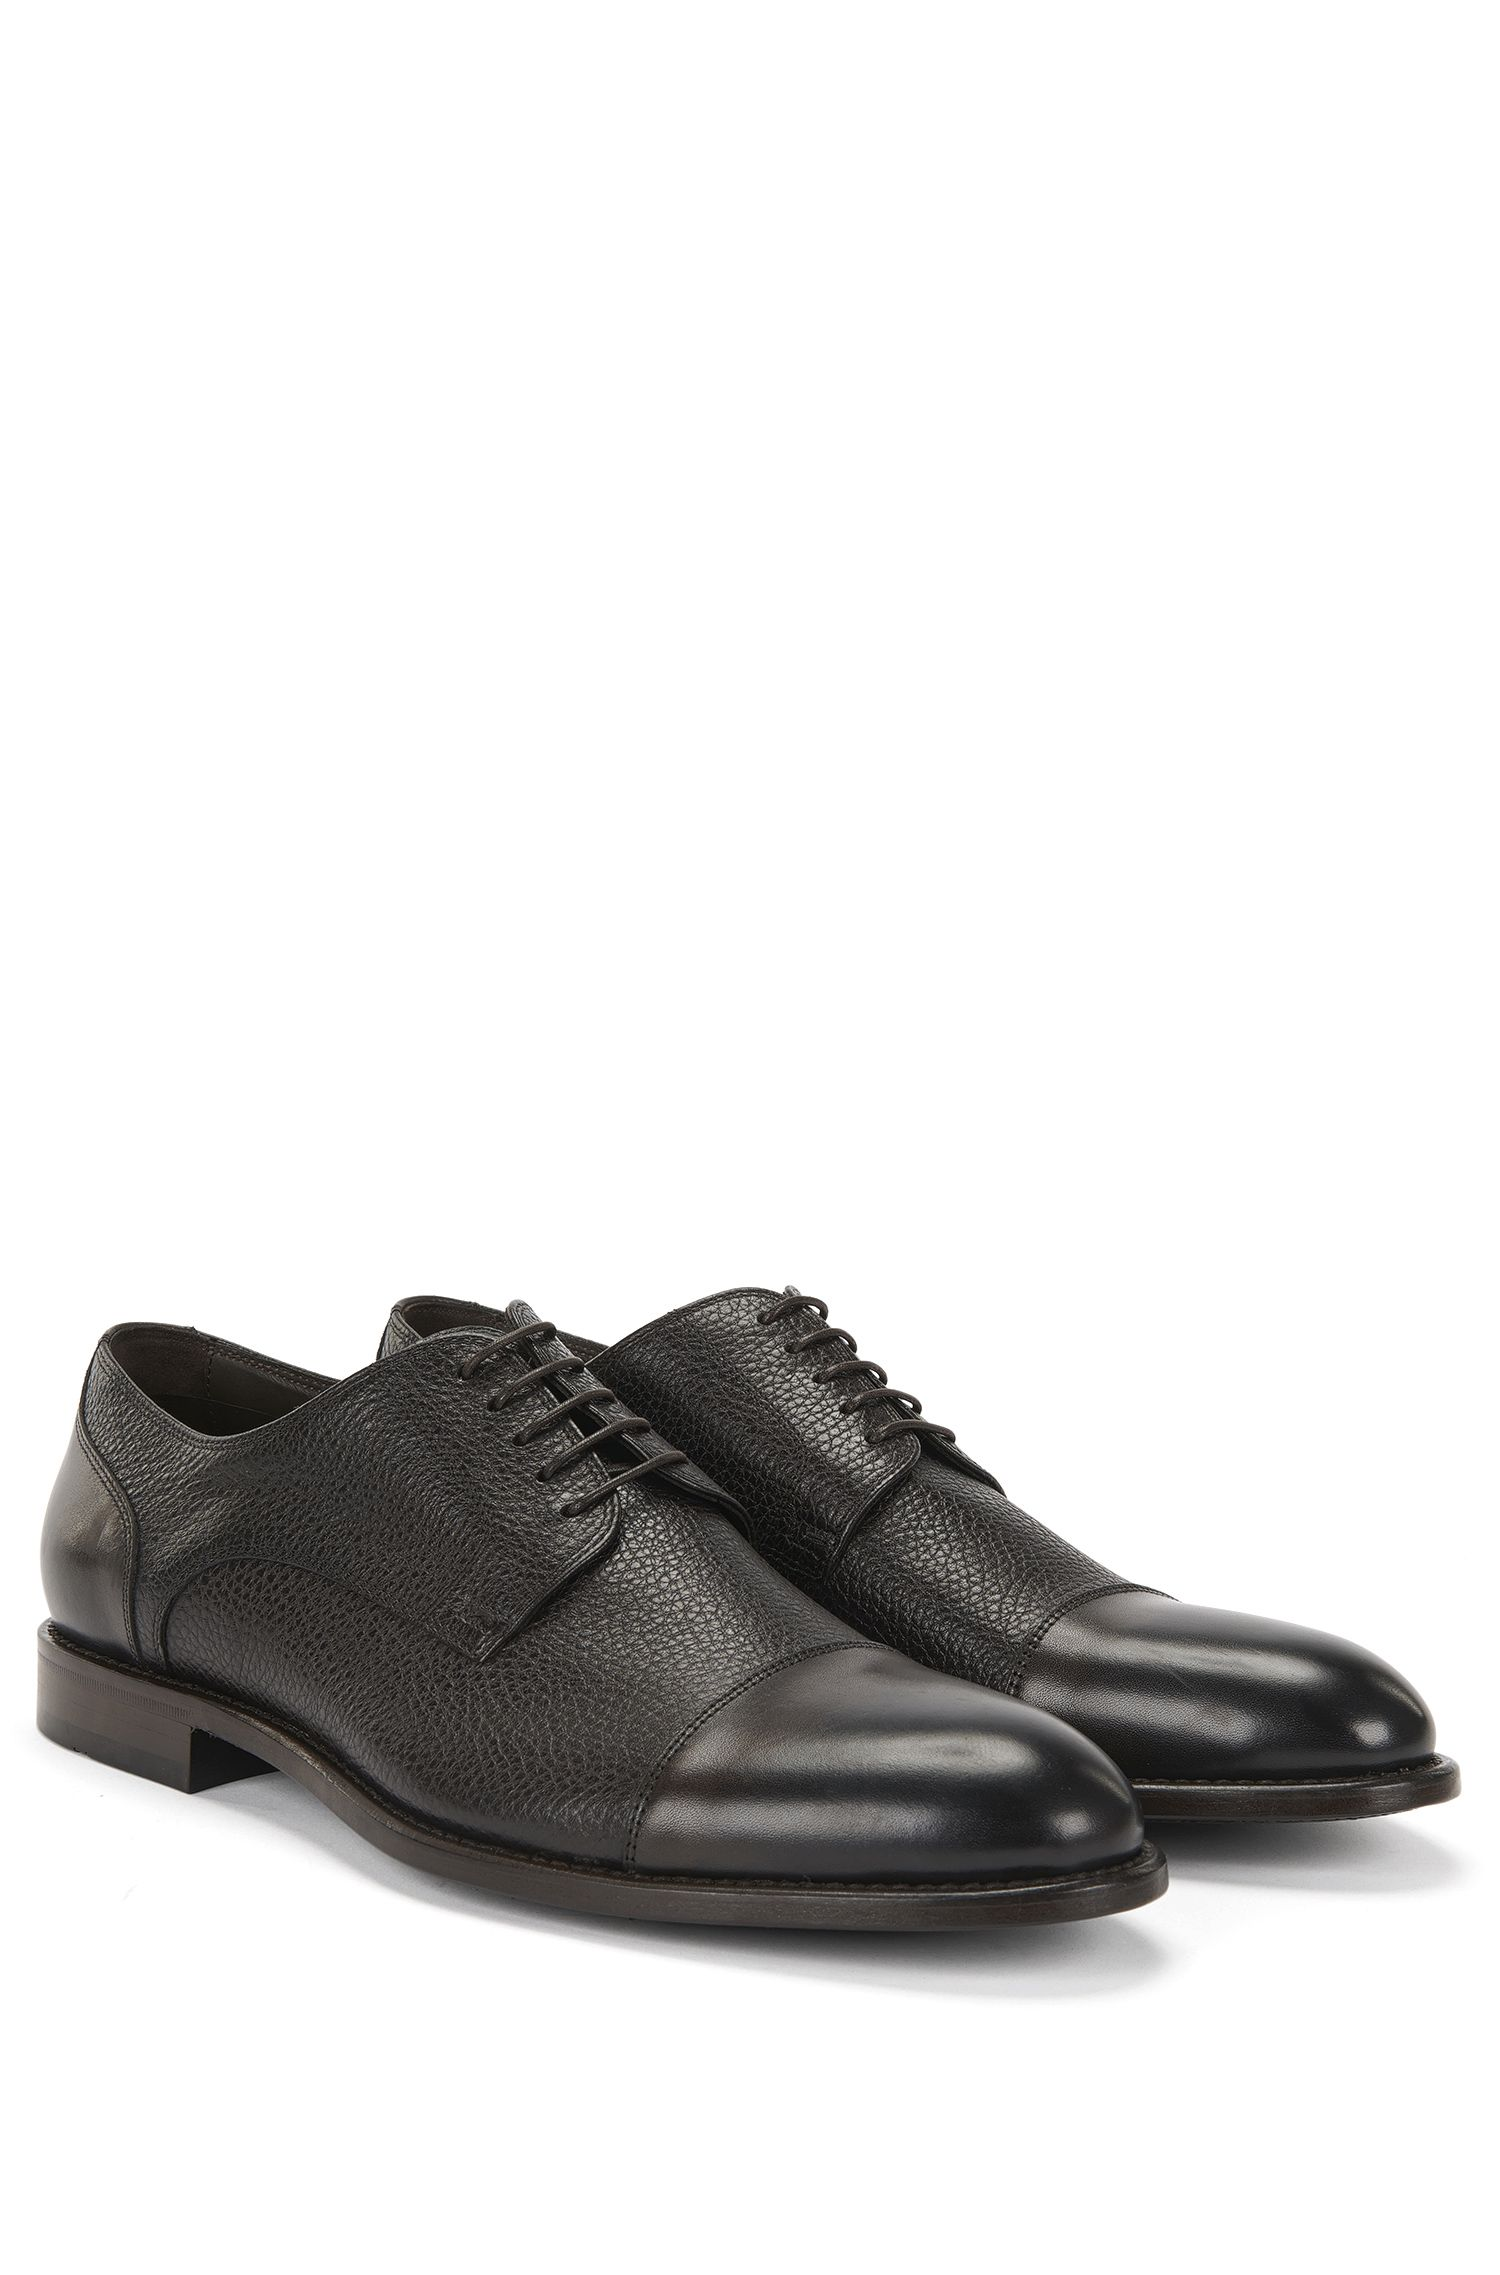 'Stockholm Derb Mxct' | Italian Calfskin Cap Toe Dress Shoes